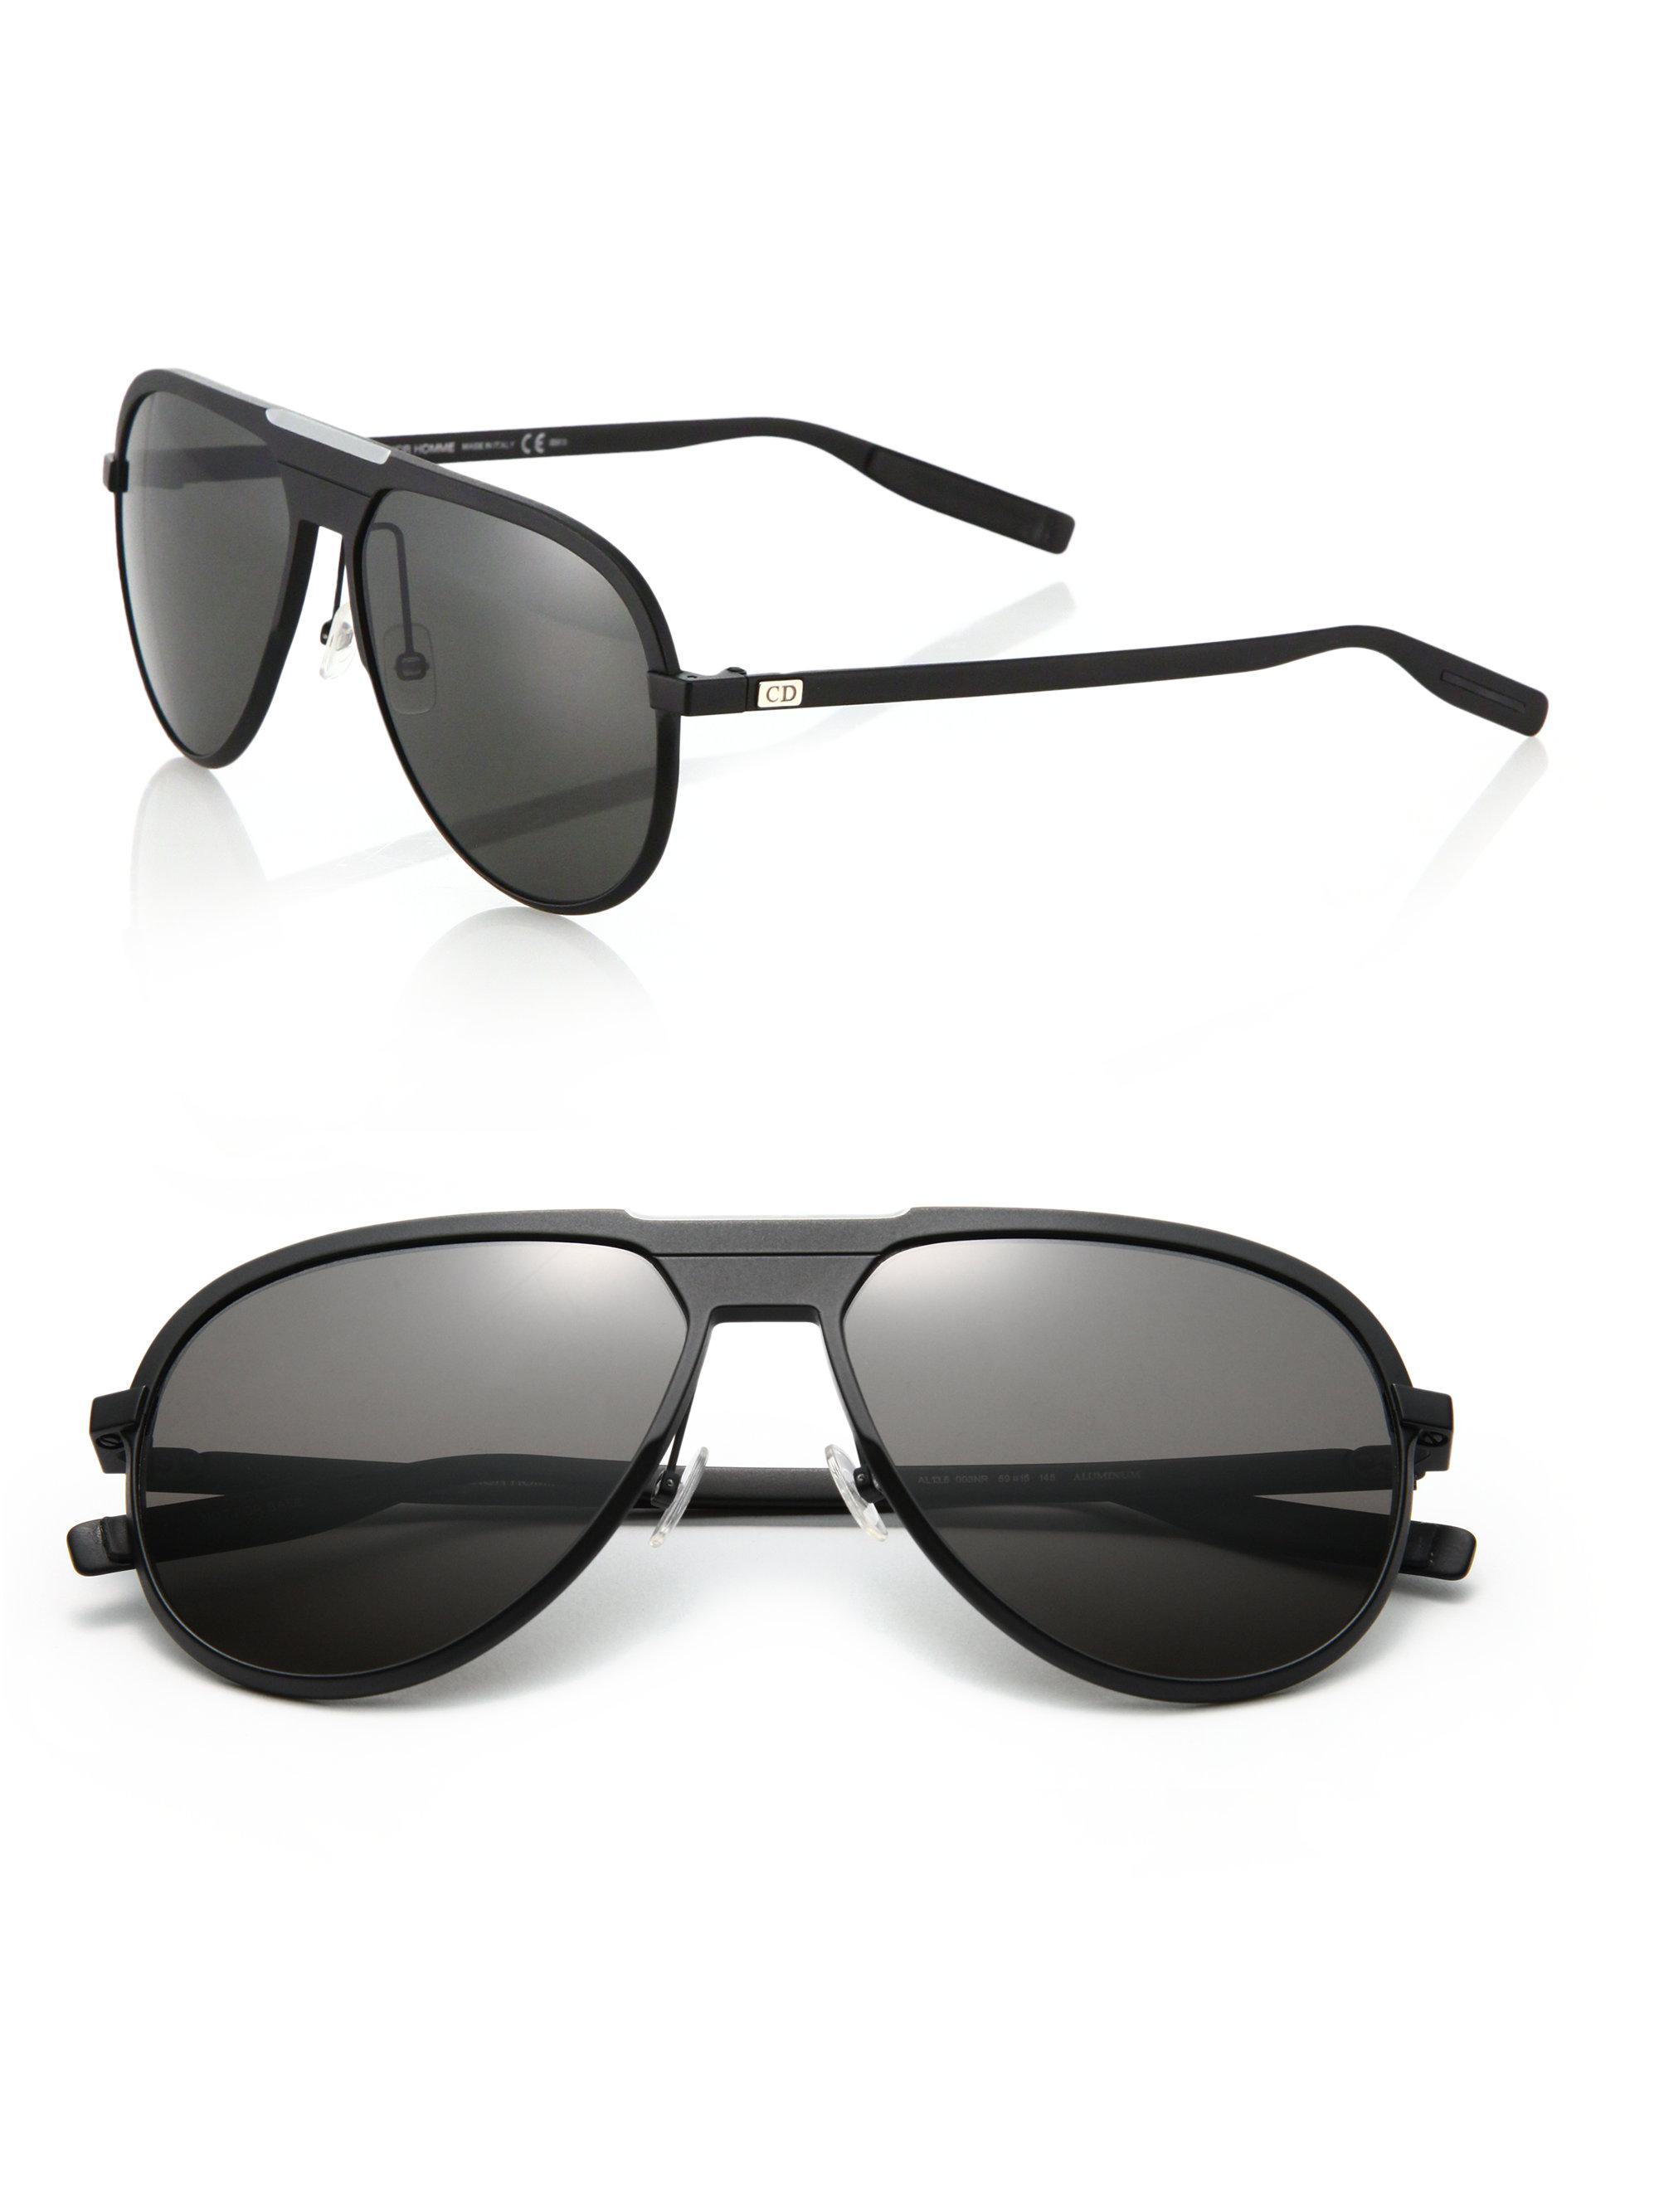 6b81a447fa4 Lyst - Dior Homme 136 s 59mm Mirror Aviator Sunglasses in Black for Men